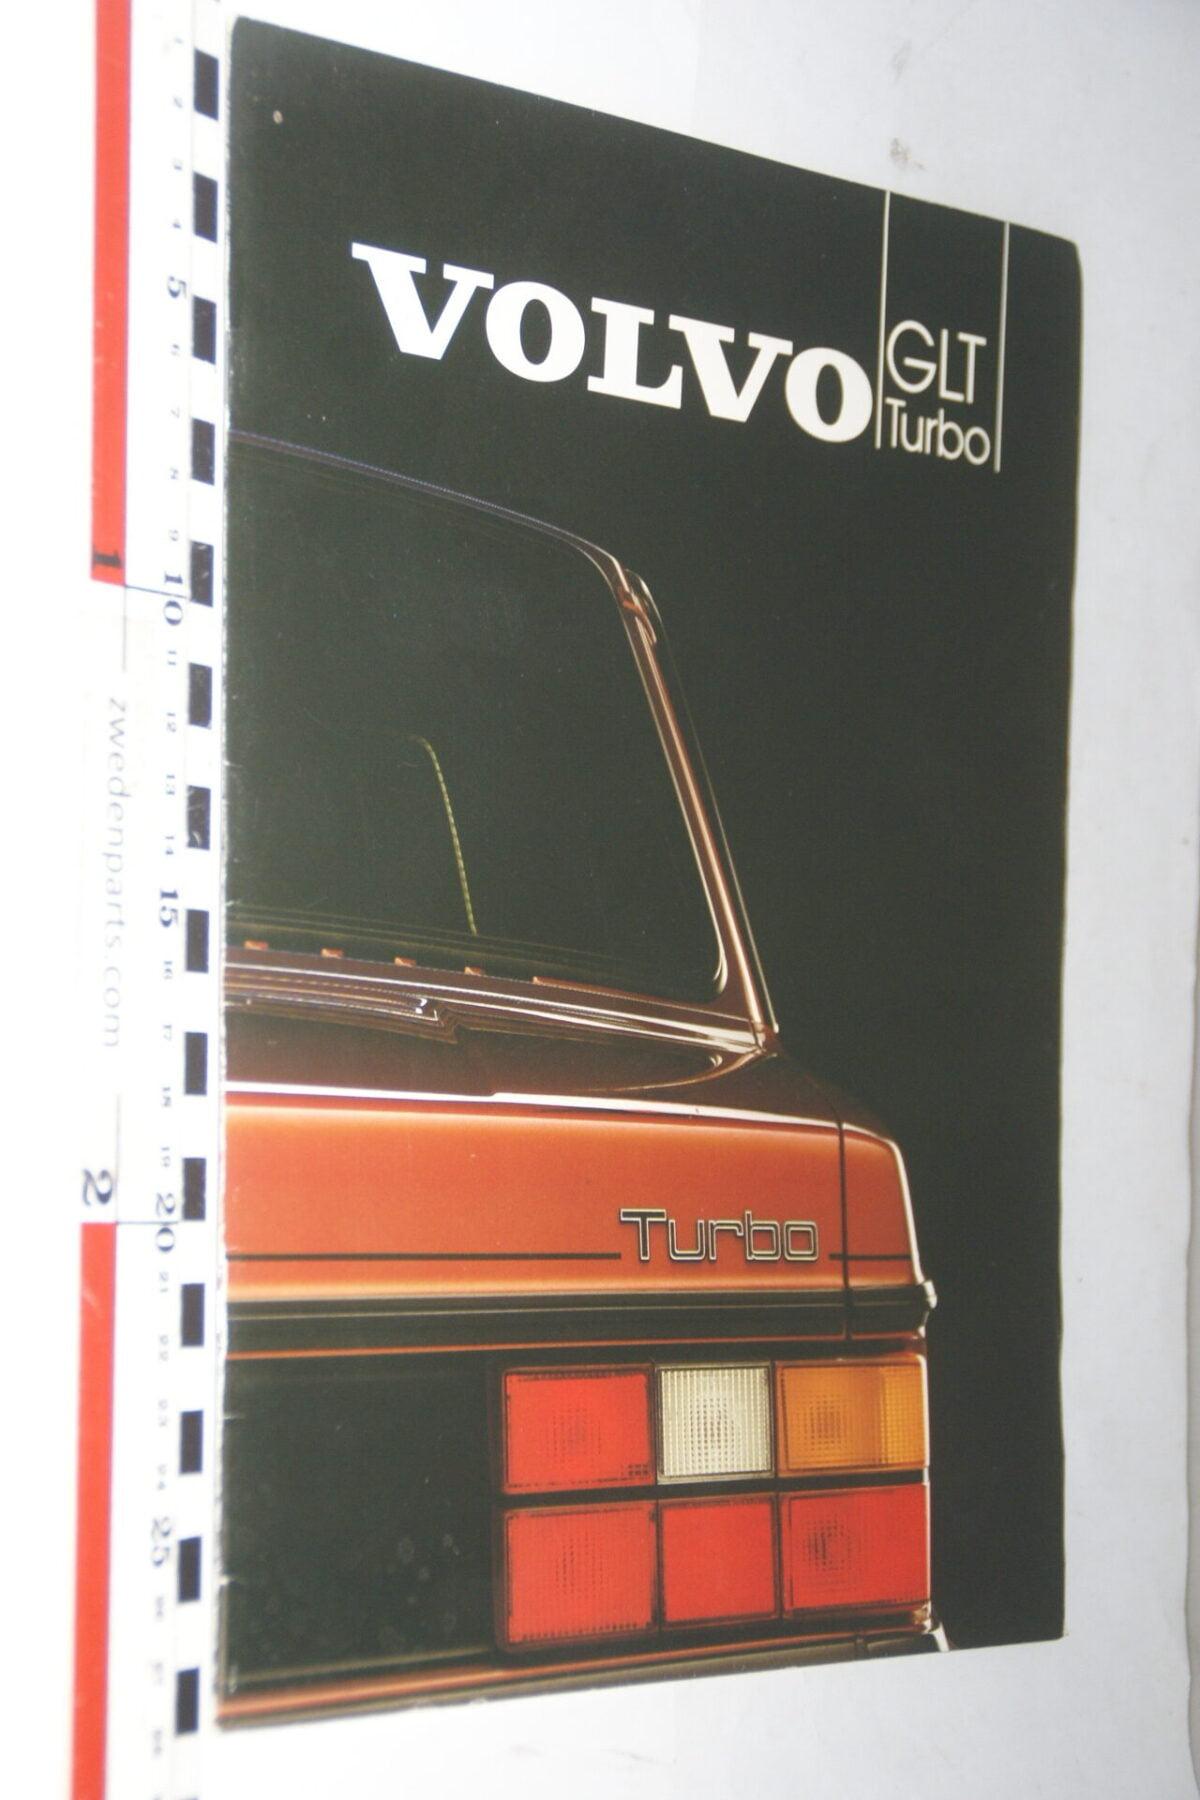 DSC07644 1982 originele brochure Volvo 244GLT Turbo nr ASPPV 9720-2, Svenska-d2ada464